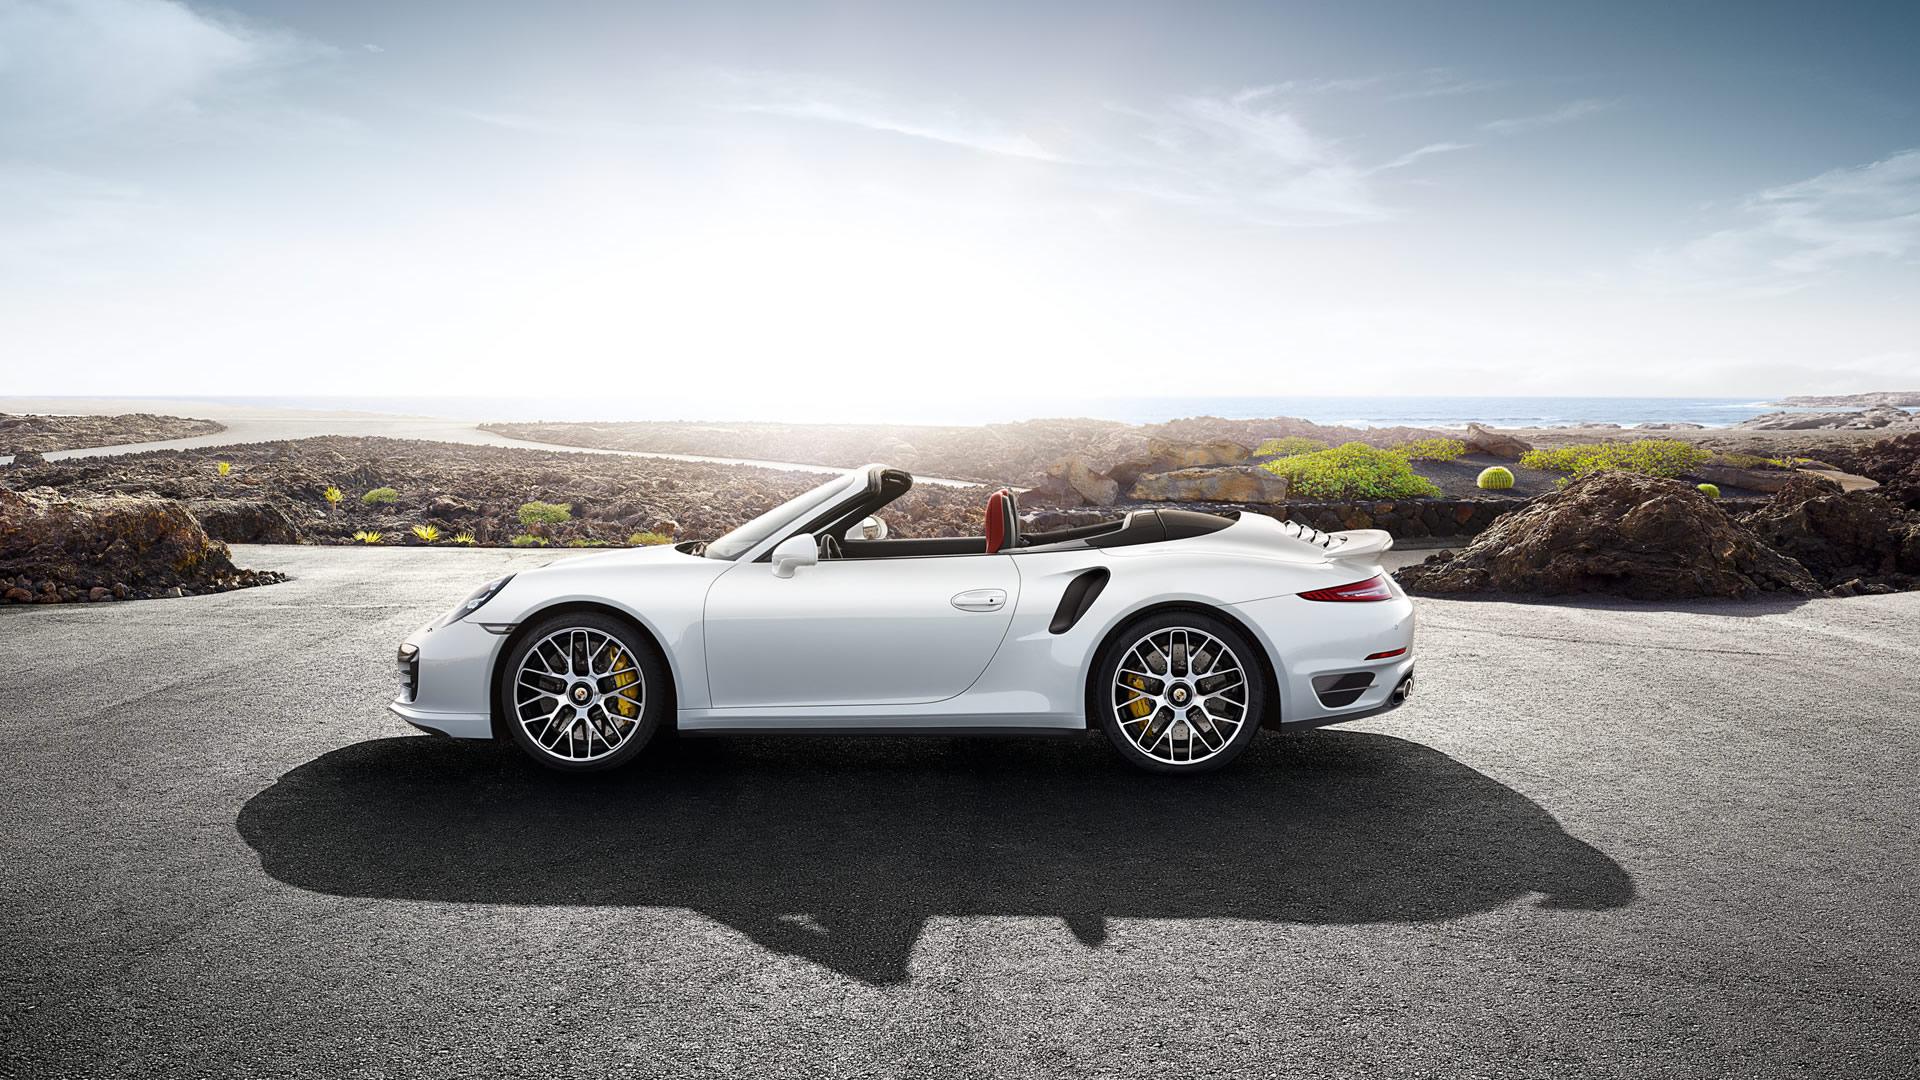 2014 Porsche 911 Turbo S Cabriolet Wallpaper   1920 x 1080 side 1920x1080